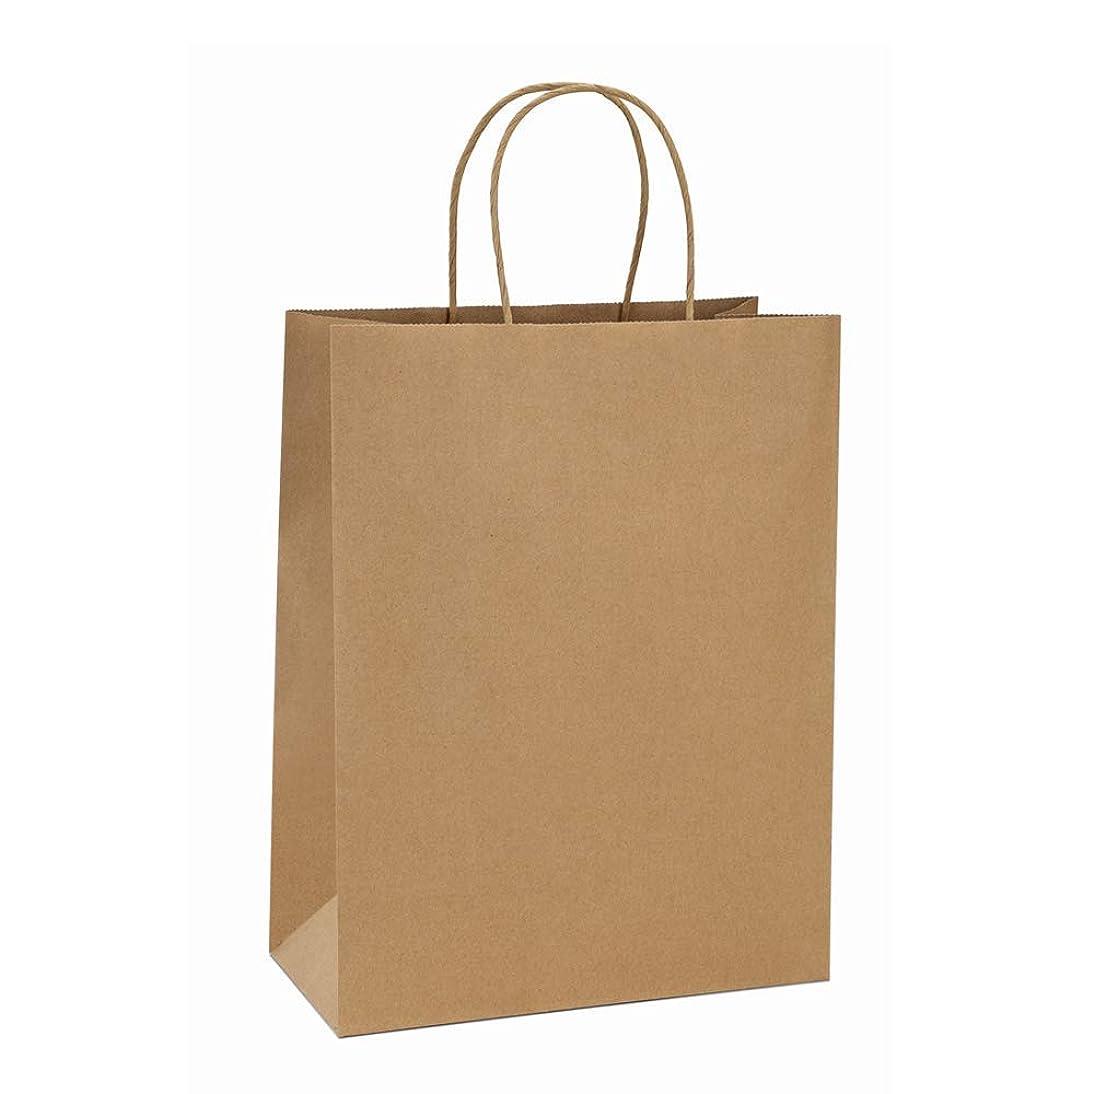 Haiquan Kraft Paper Bags Gift Bags Bulk with Handles100Pcs 10